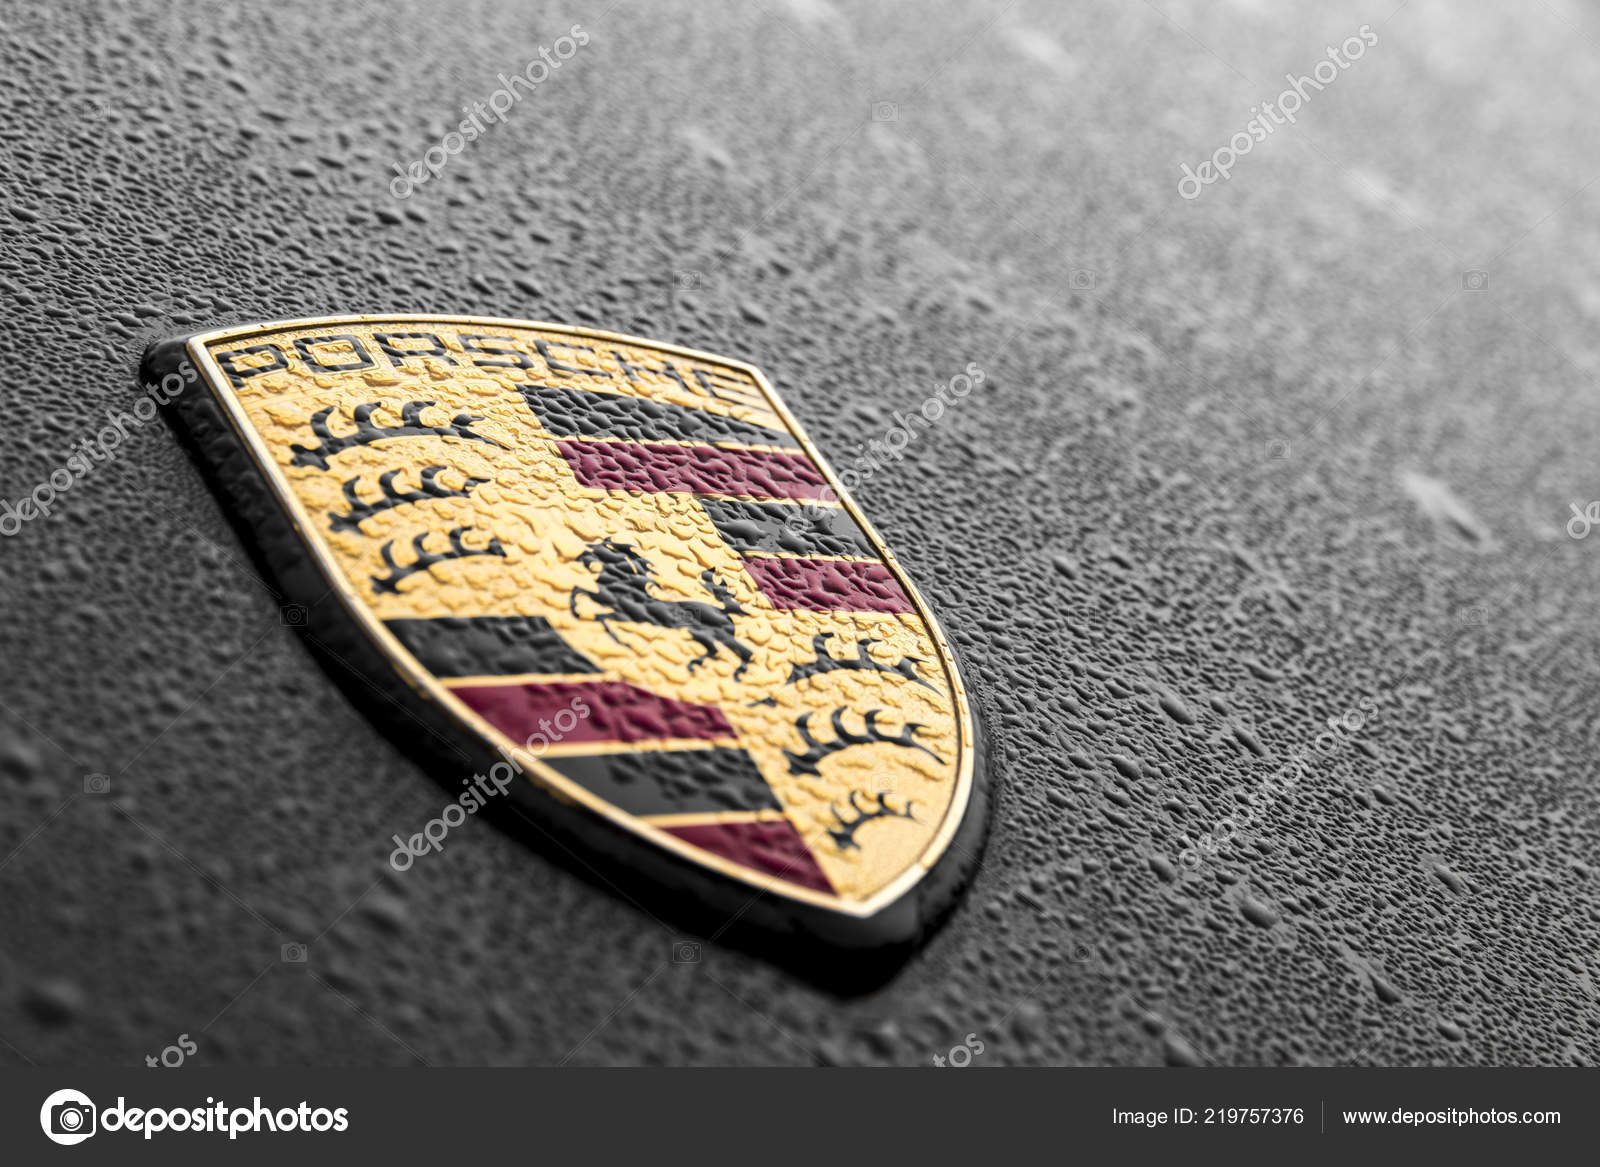 Porsche Logo Black Car Water Raindrops Stock Editorial Photo C Jqnoc 219757376